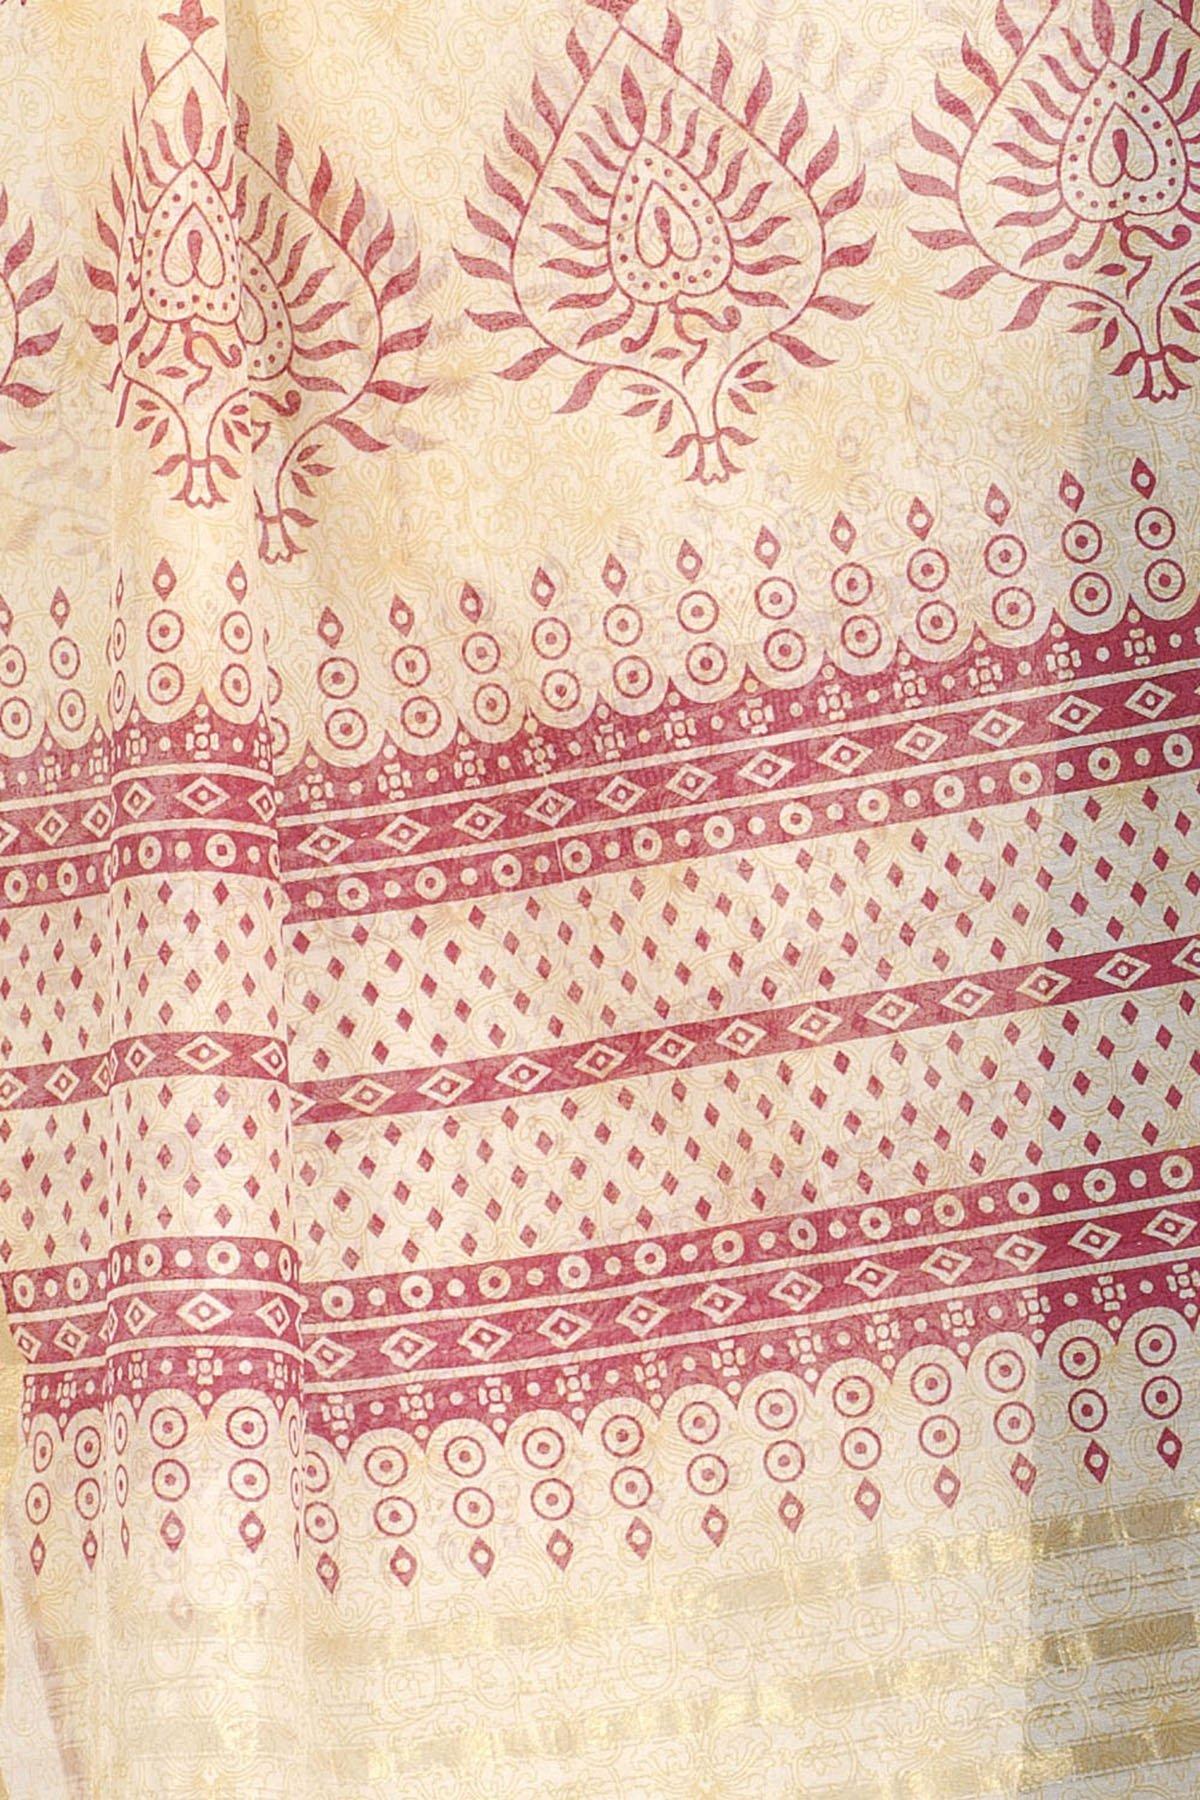 Chandrakala Women's Handwoven Resham work Banarasi Dupatta Stole Scarf (Red) by Chandrakala (Image #4)